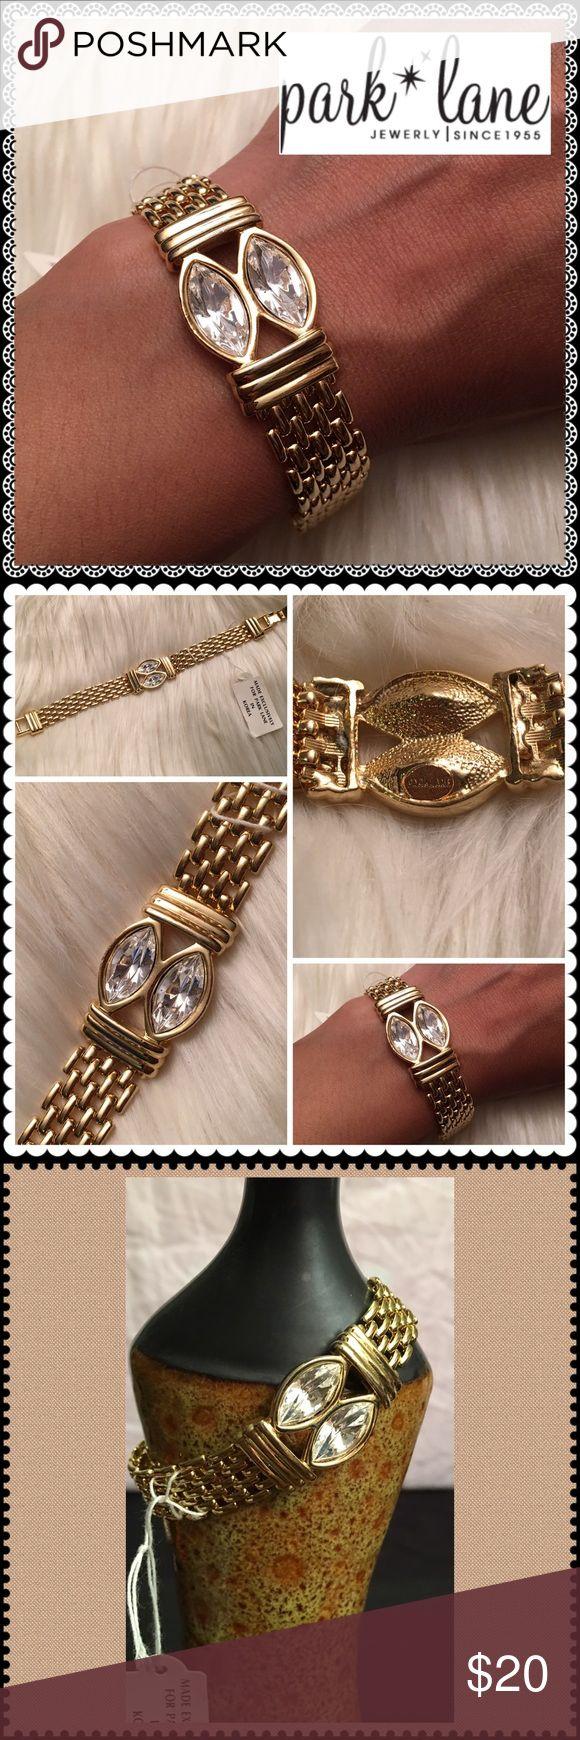 NEW Golden bracelet w/Jewels PARK LANE NEW Golden bracelet w/Jewels PARK LANE Park Lane Jewelry Bracelets